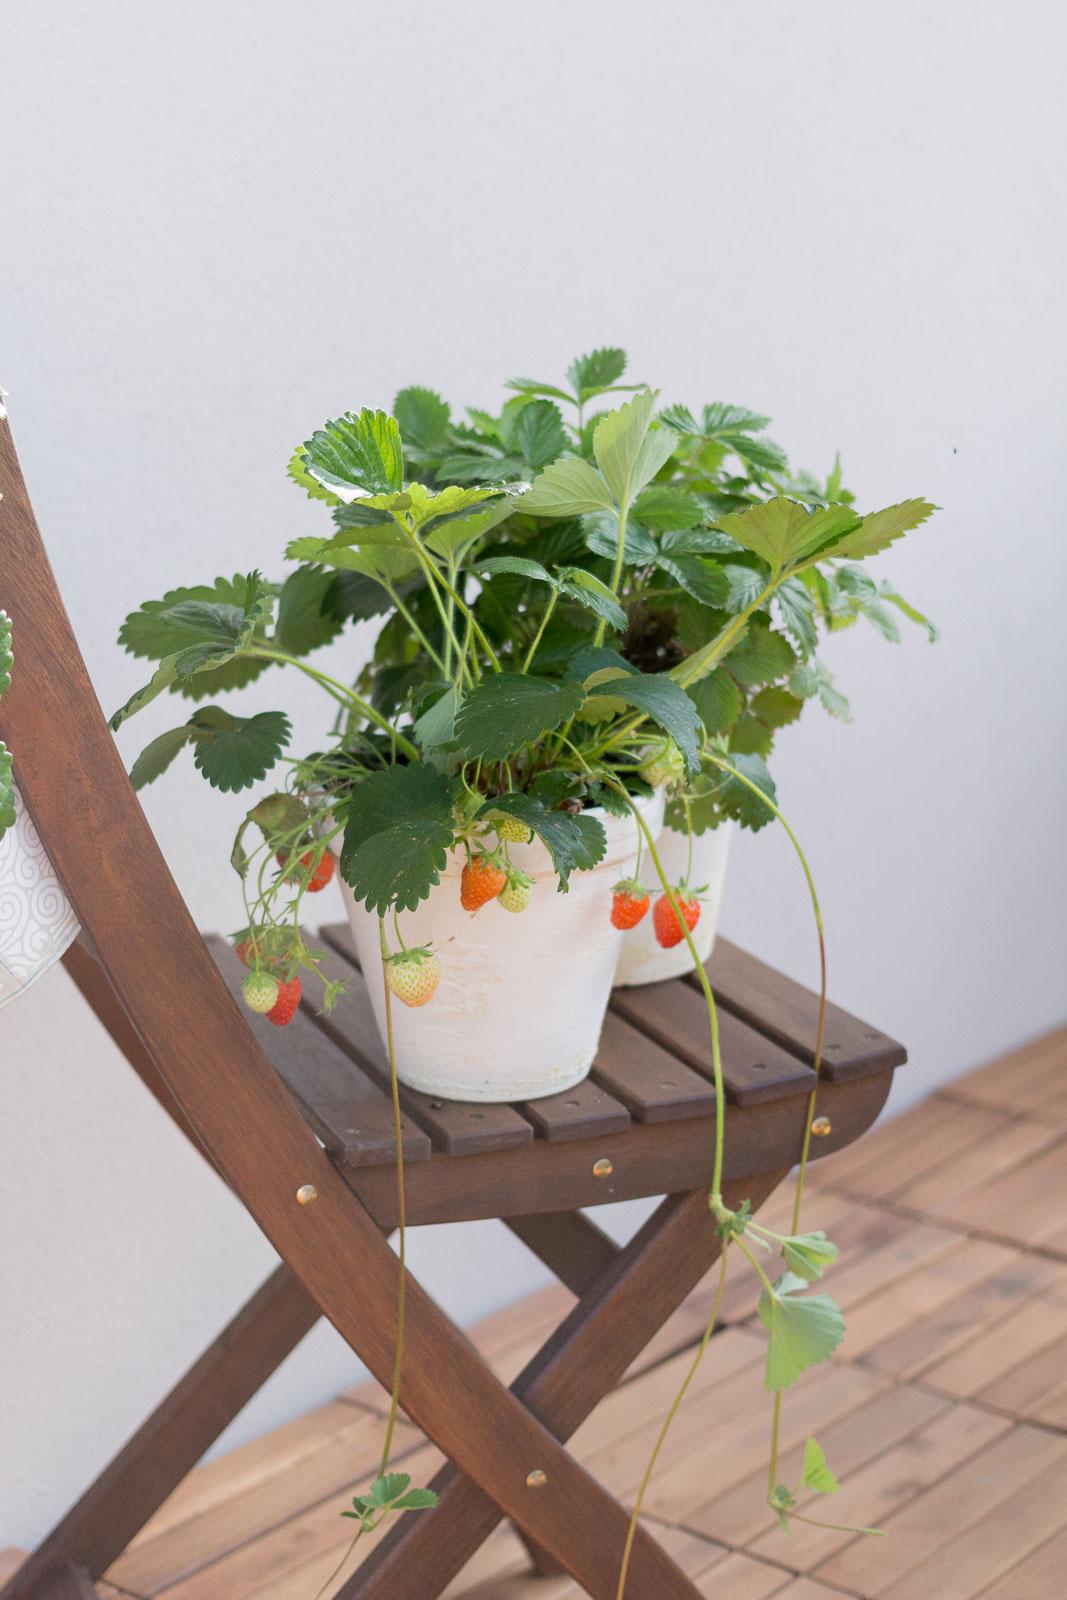 Geliebte Alles über Erdbeeren: Egal ob Balkon oder Garten &DX_88